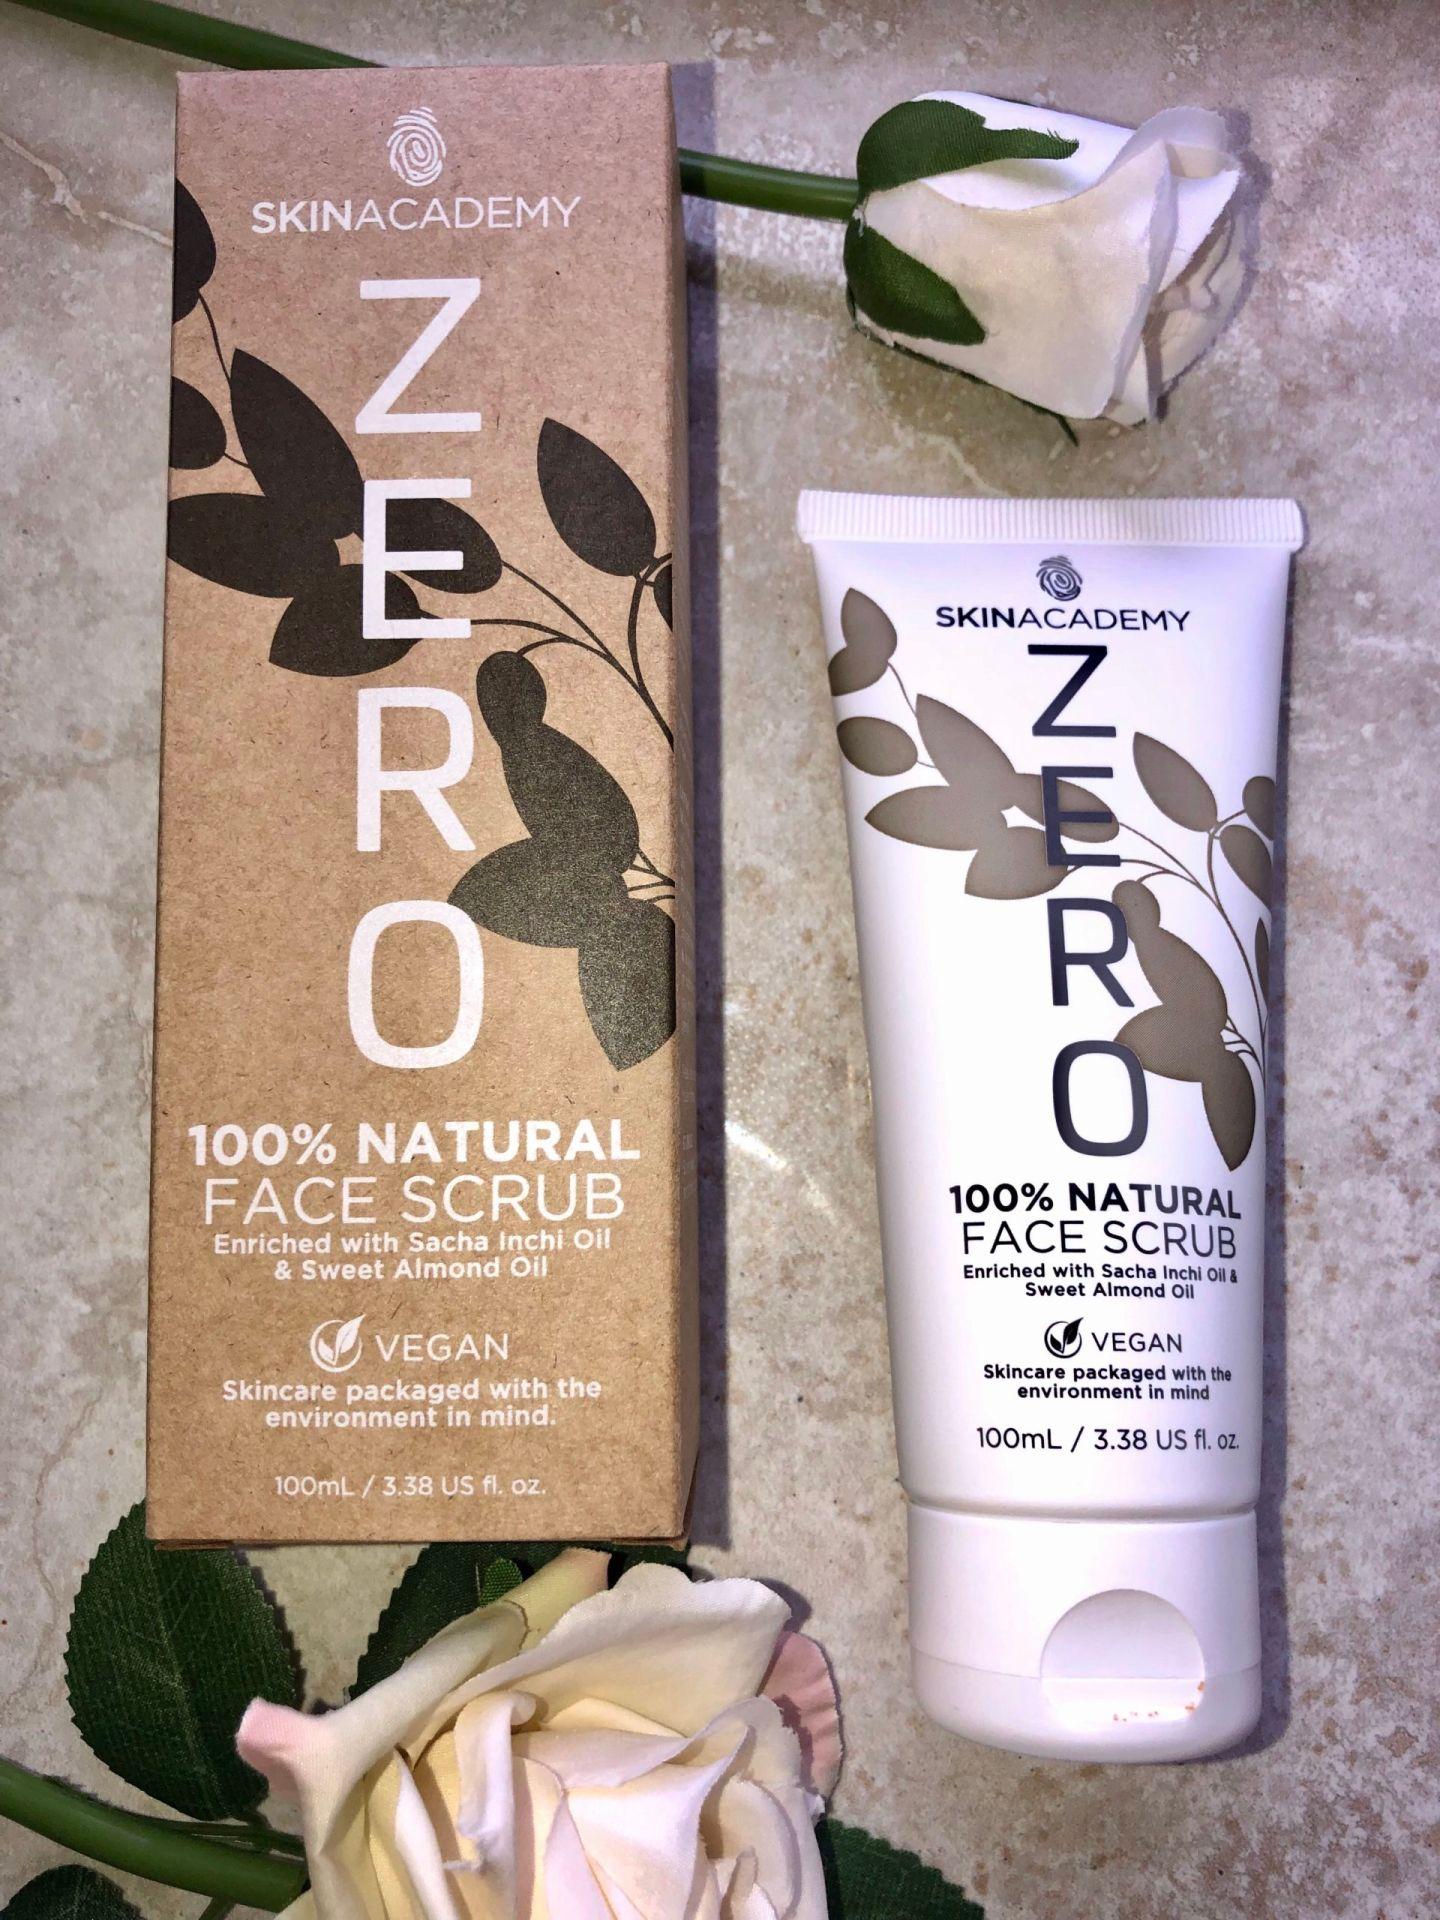 Skin Academy ZERO Skincare Review - FACE SCRUB